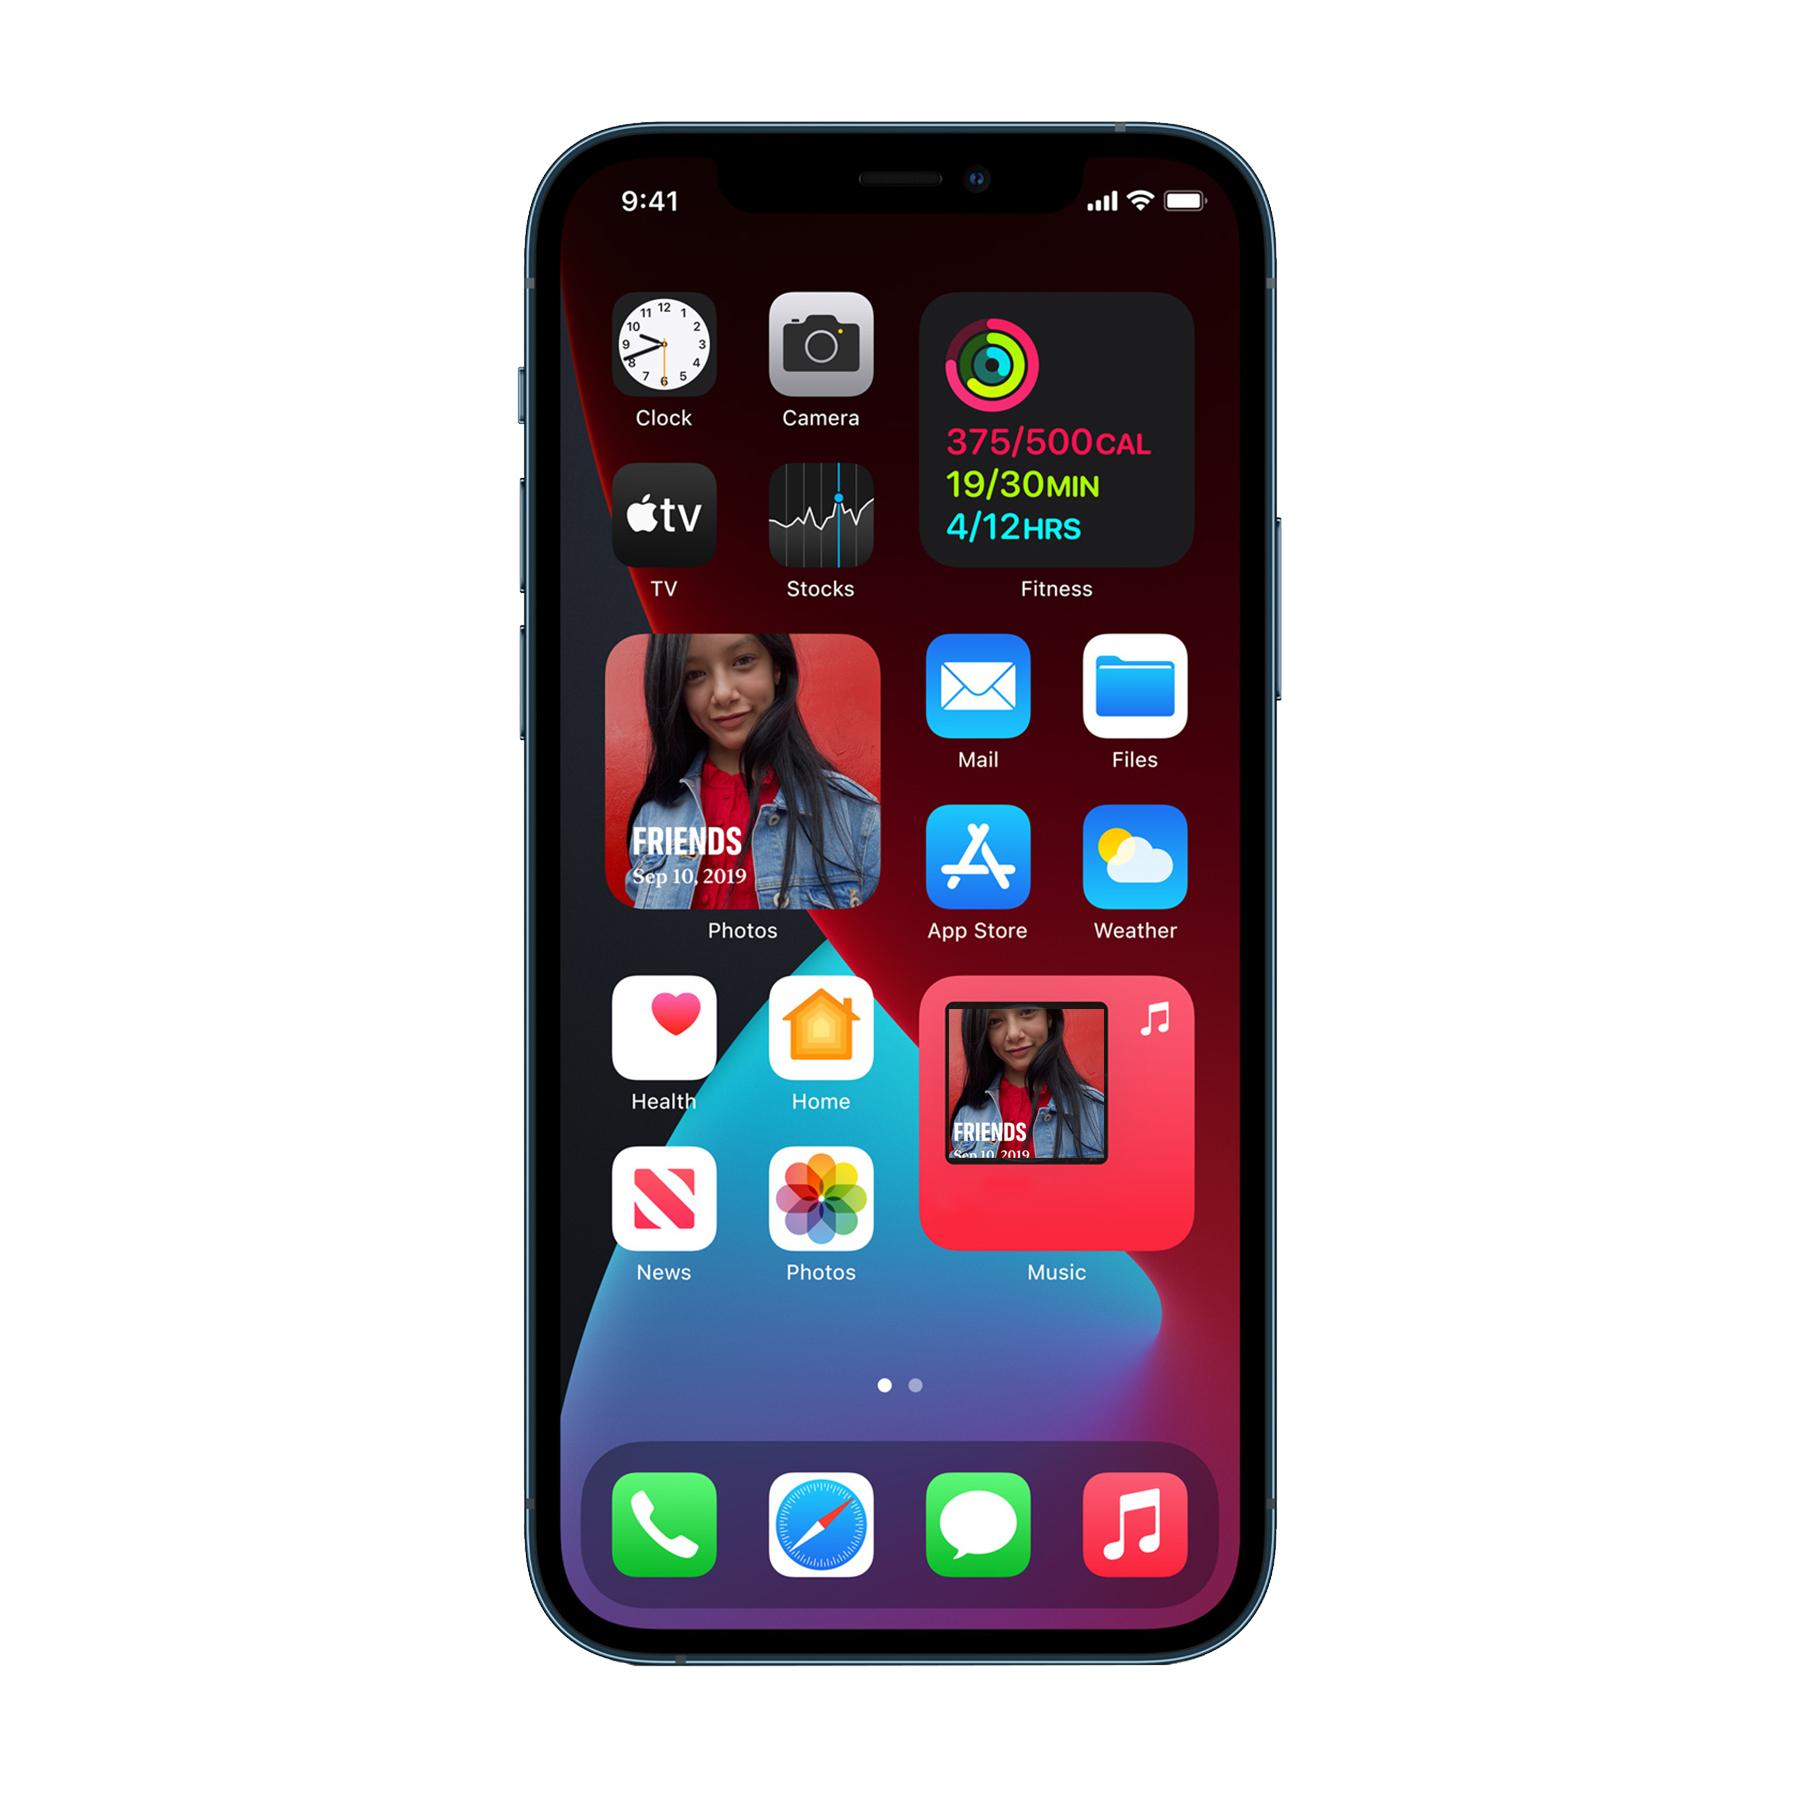 گوشی موبایل اپل مدل iPhone 12 Pro A2407 دو سیم کارت ظرفیت 512 گیگابایت